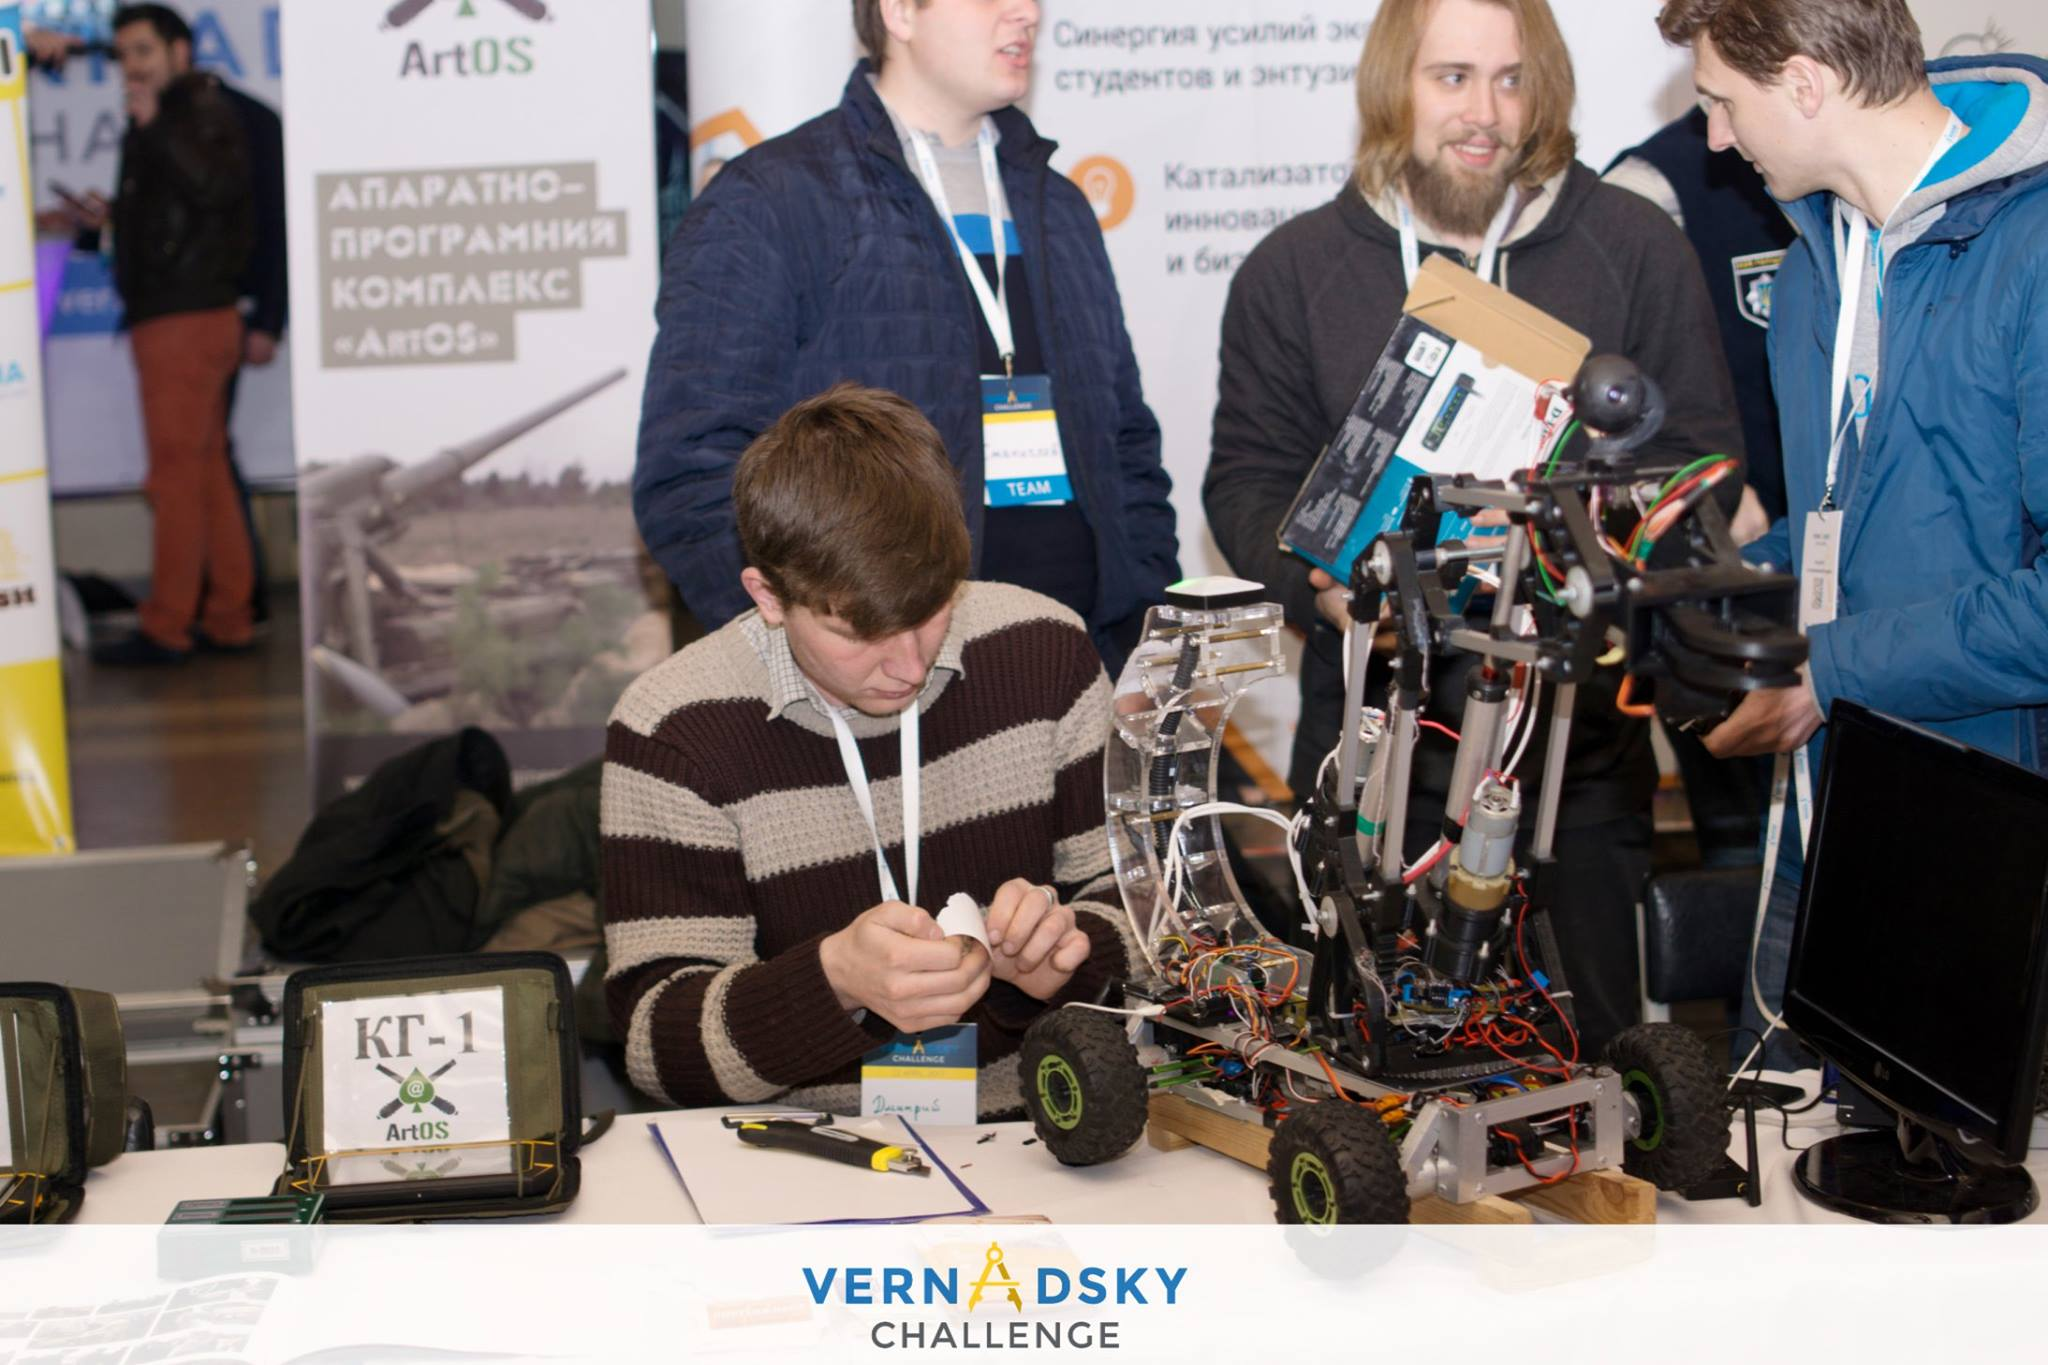 Association Noosphere of Max Polyakov Puts Vernadsky Challenge 2018 on hold